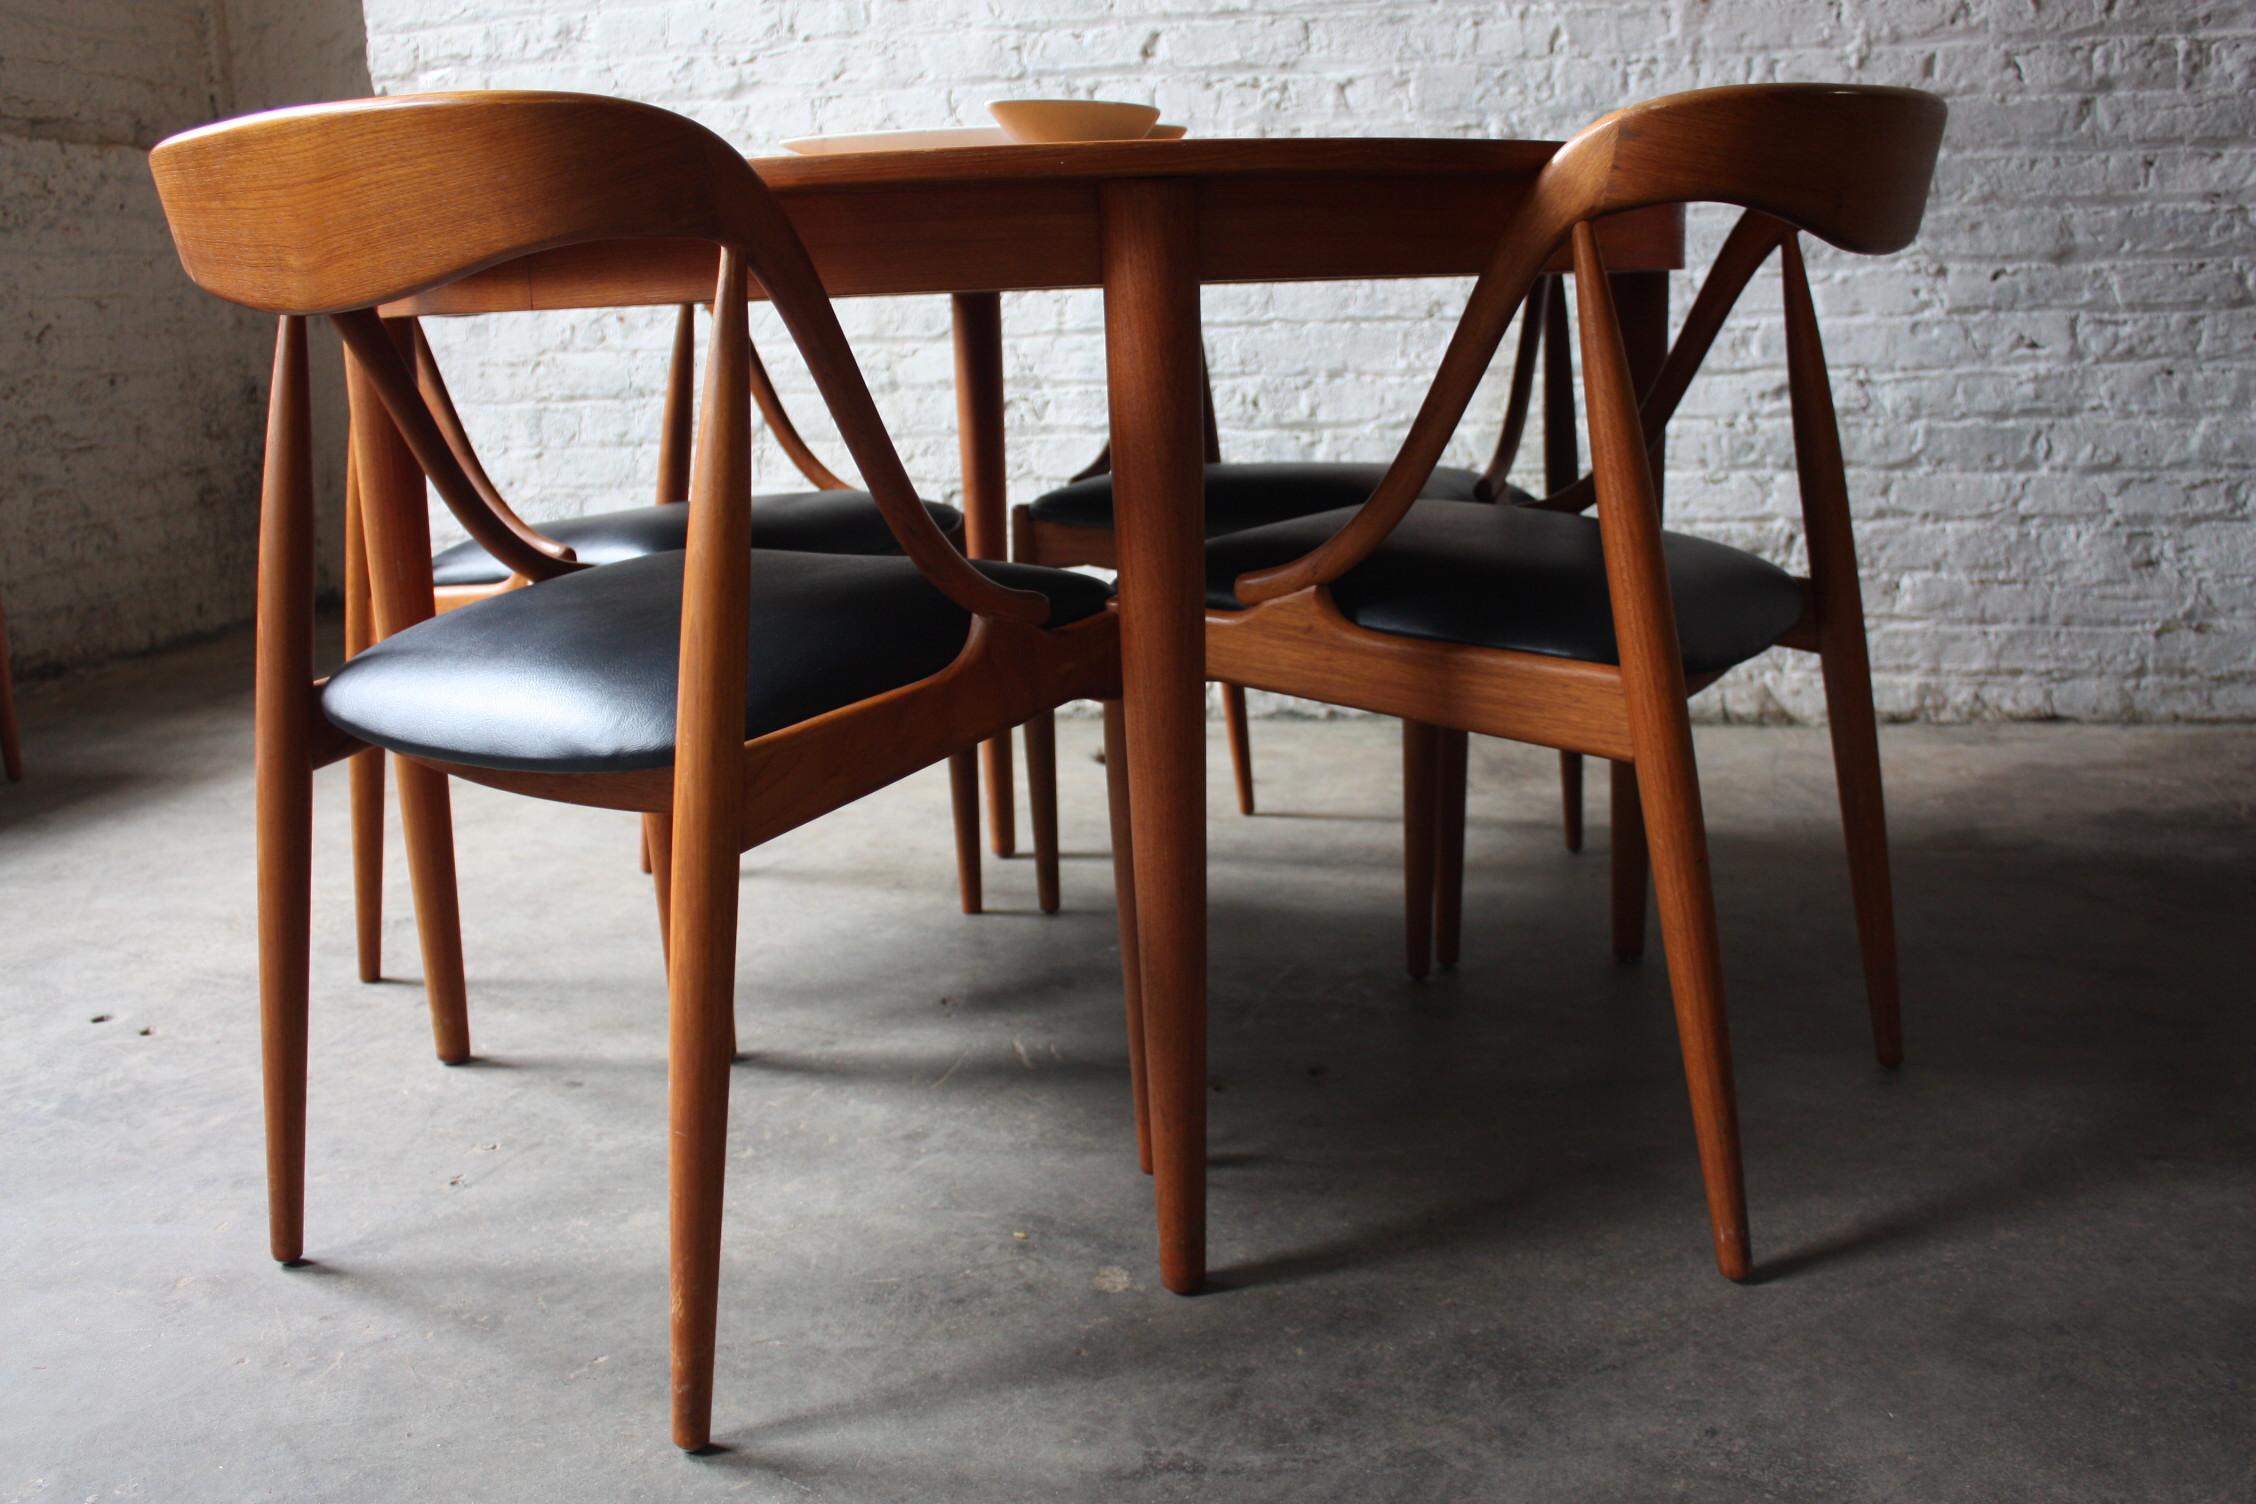 Terrific Breathtaking Johannes Andersen Danish Modern Teak Dining Creativecarmelina Interior Chair Design Creativecarmelinacom